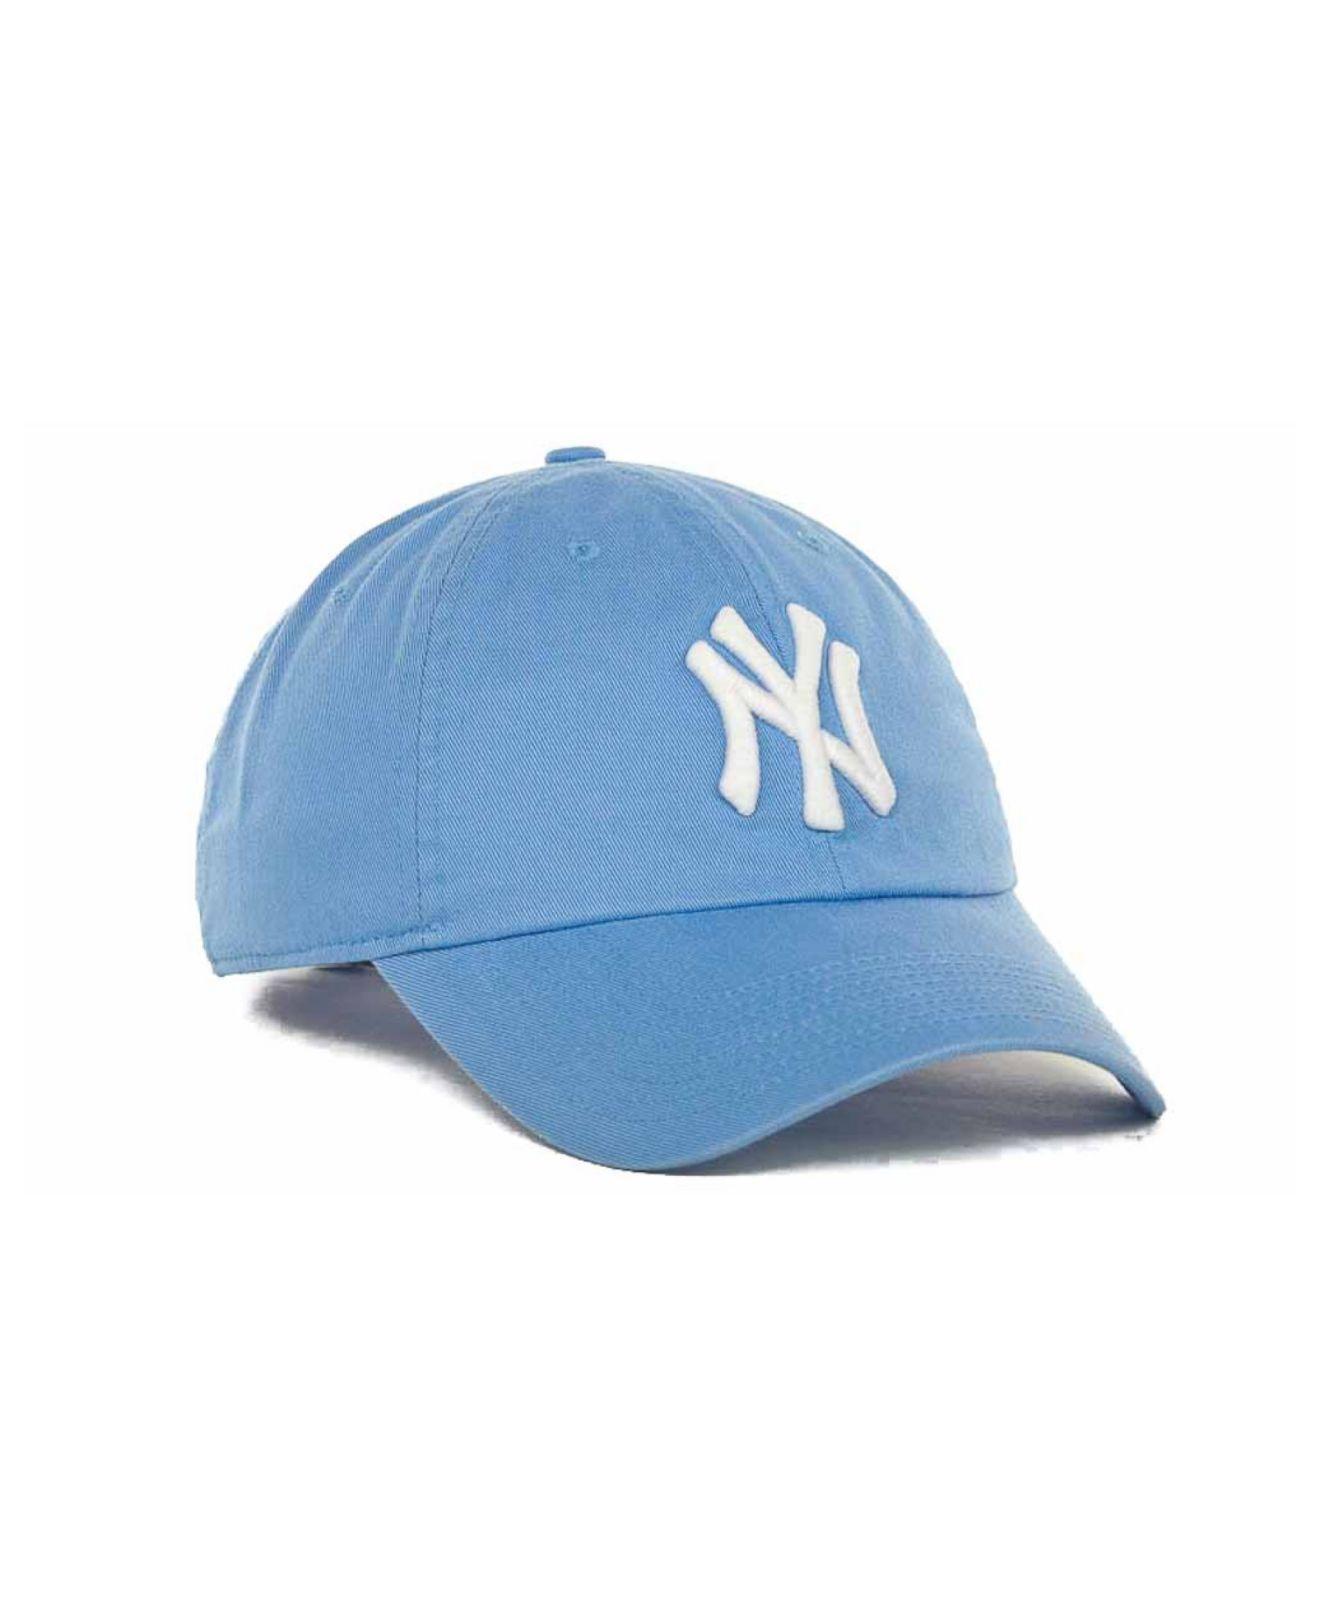 750efcb5fe80a6 ... promo code for lyst nike womens new york yankees stadium cap in blue  77314 f8a3c